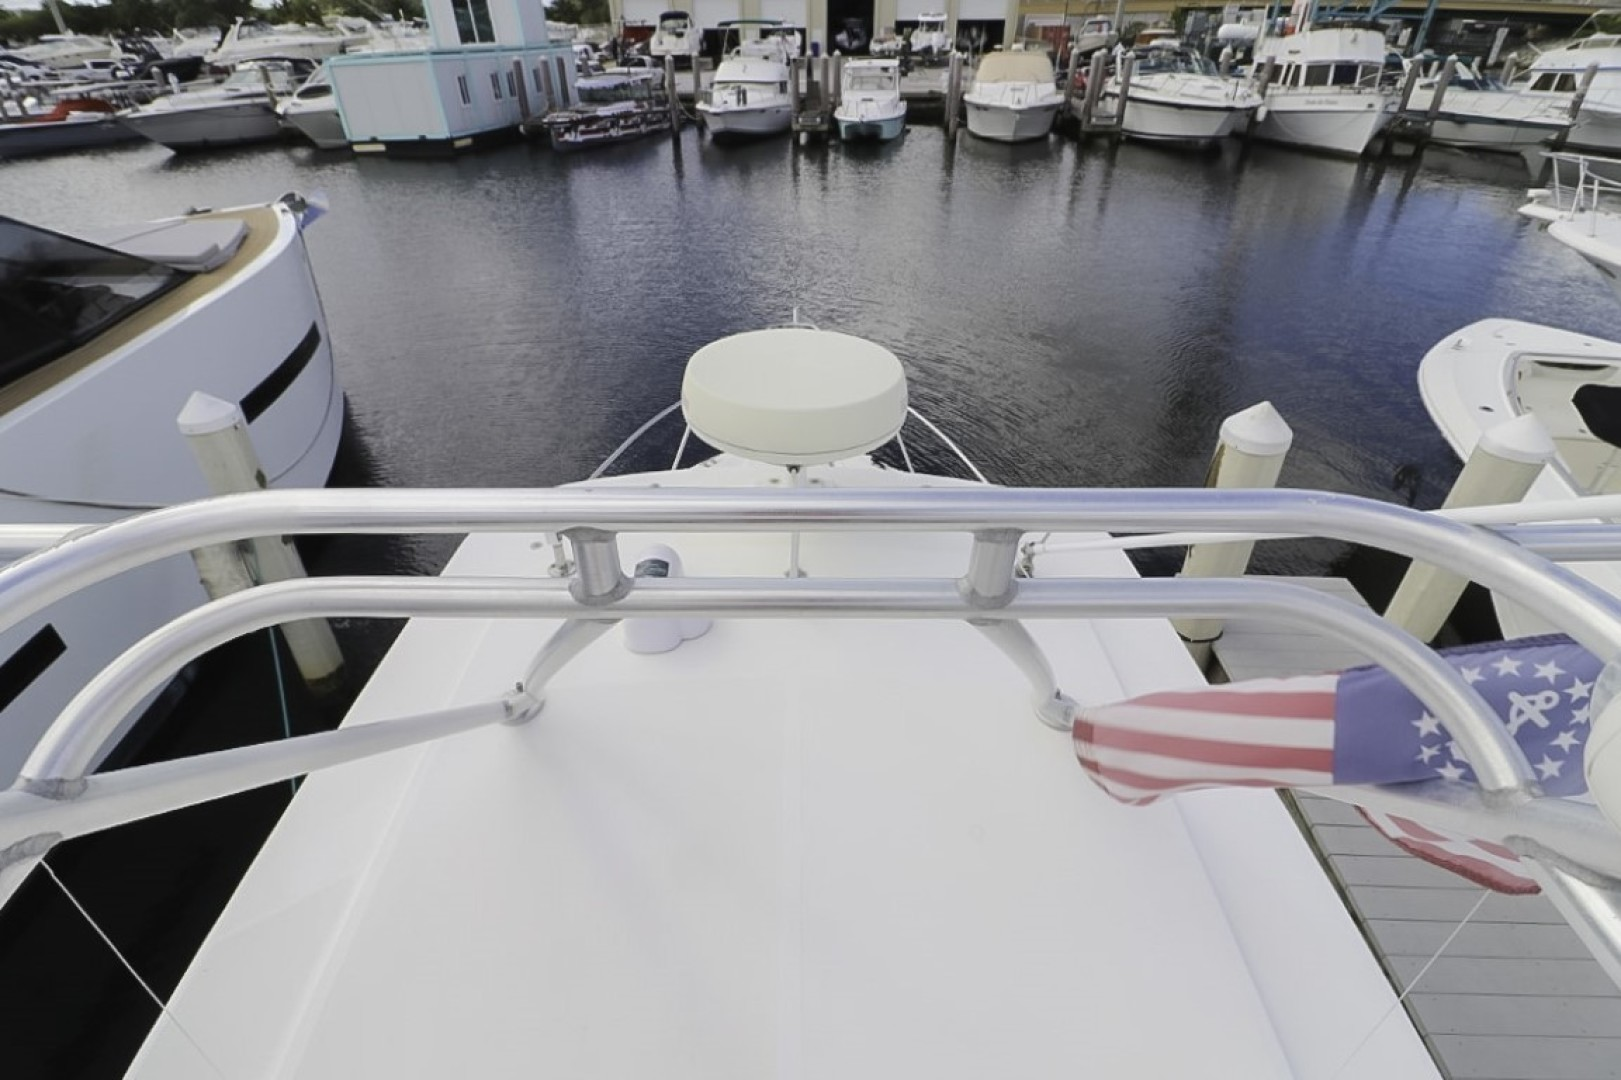 Boston Whaler-280 Outrage 2001 -Fort Lauderdale-Florida-United States-1566099 | Thumbnail